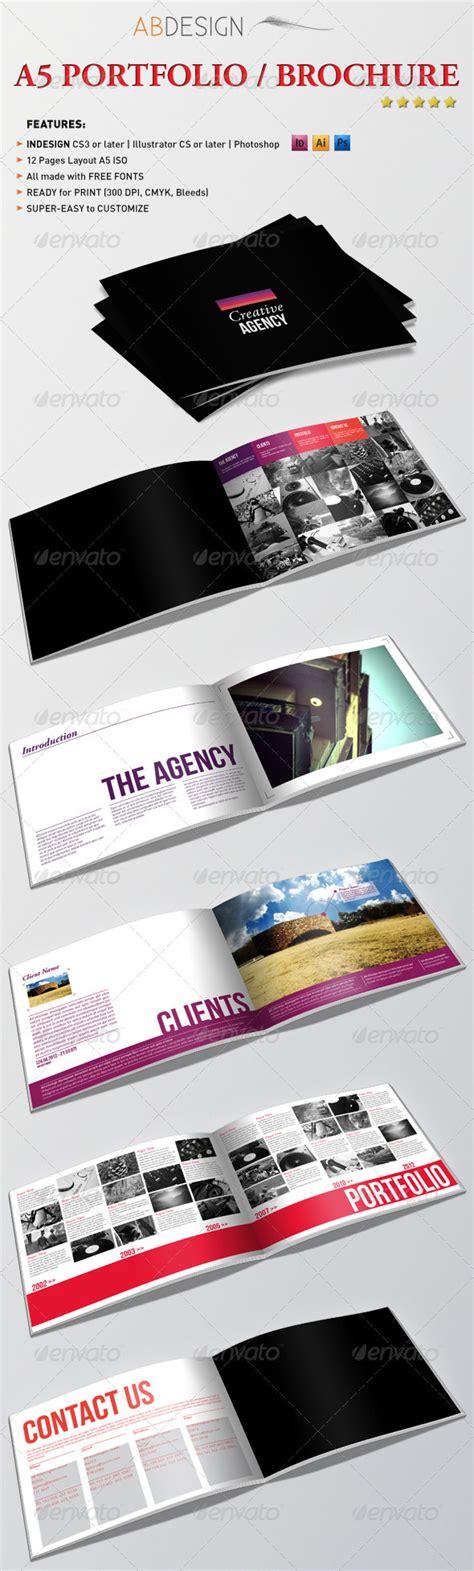 layout a5 brochure a5 portfolio brochure graphicriver